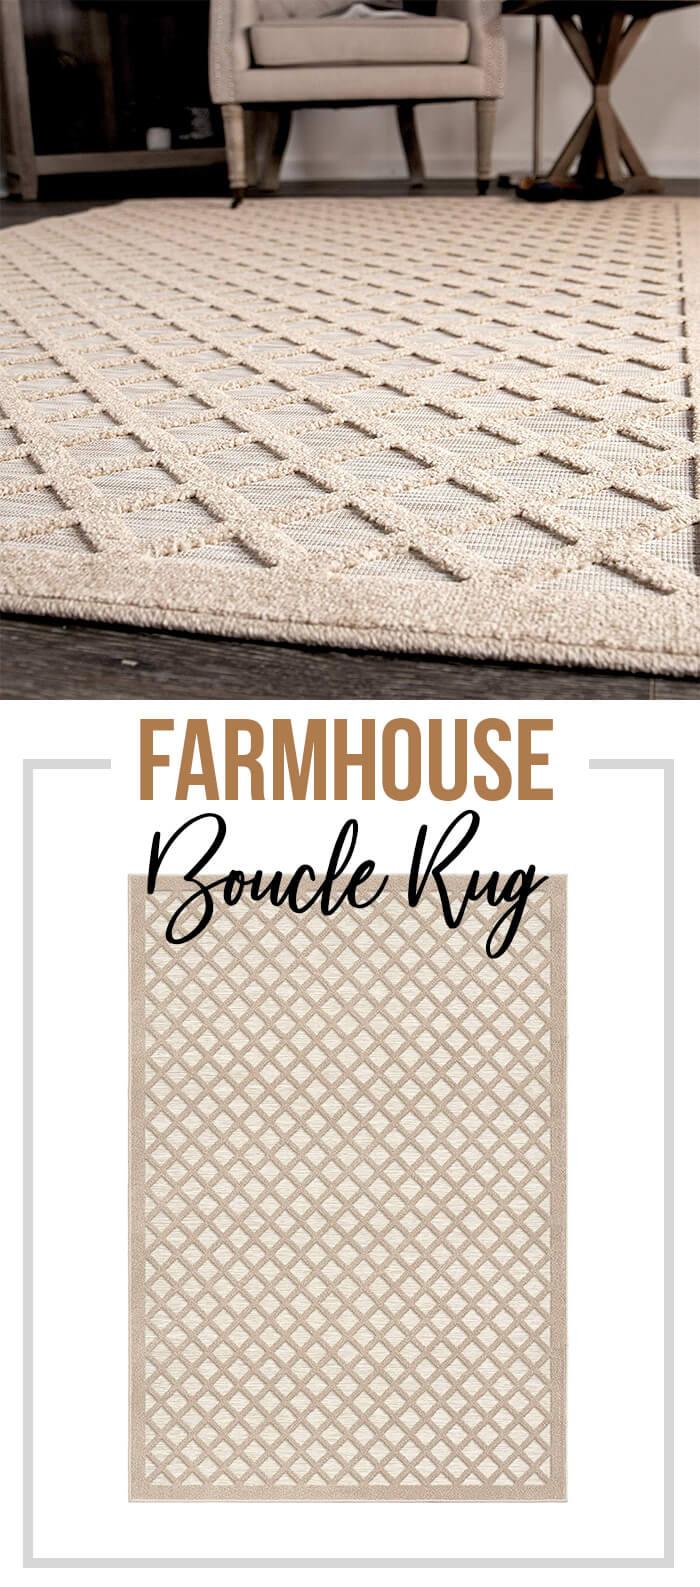 Indoor/Outdoor Farmhouse Boucle Area Rug